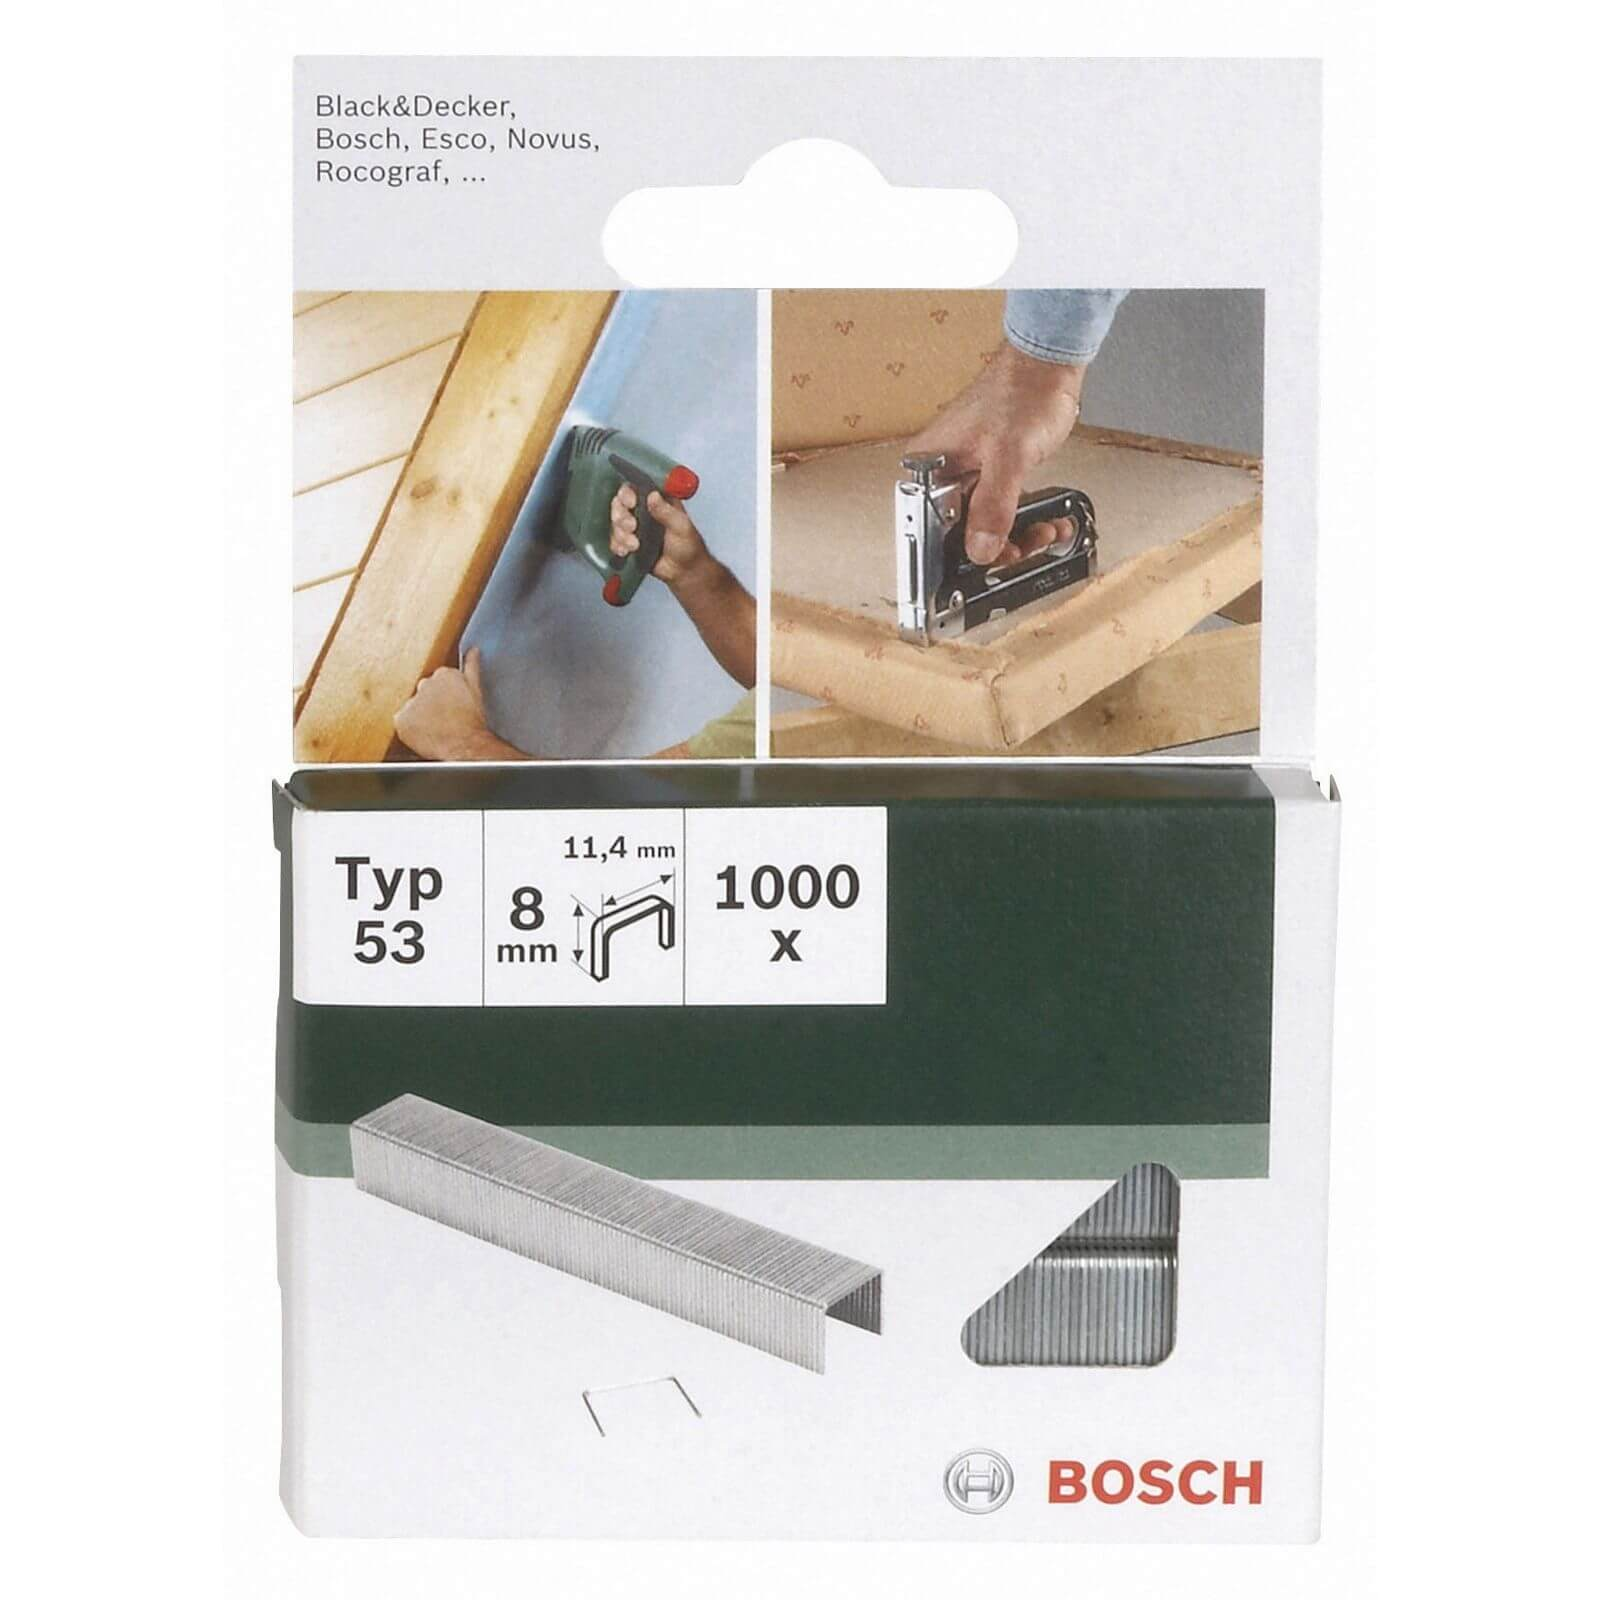 Bosch Staples